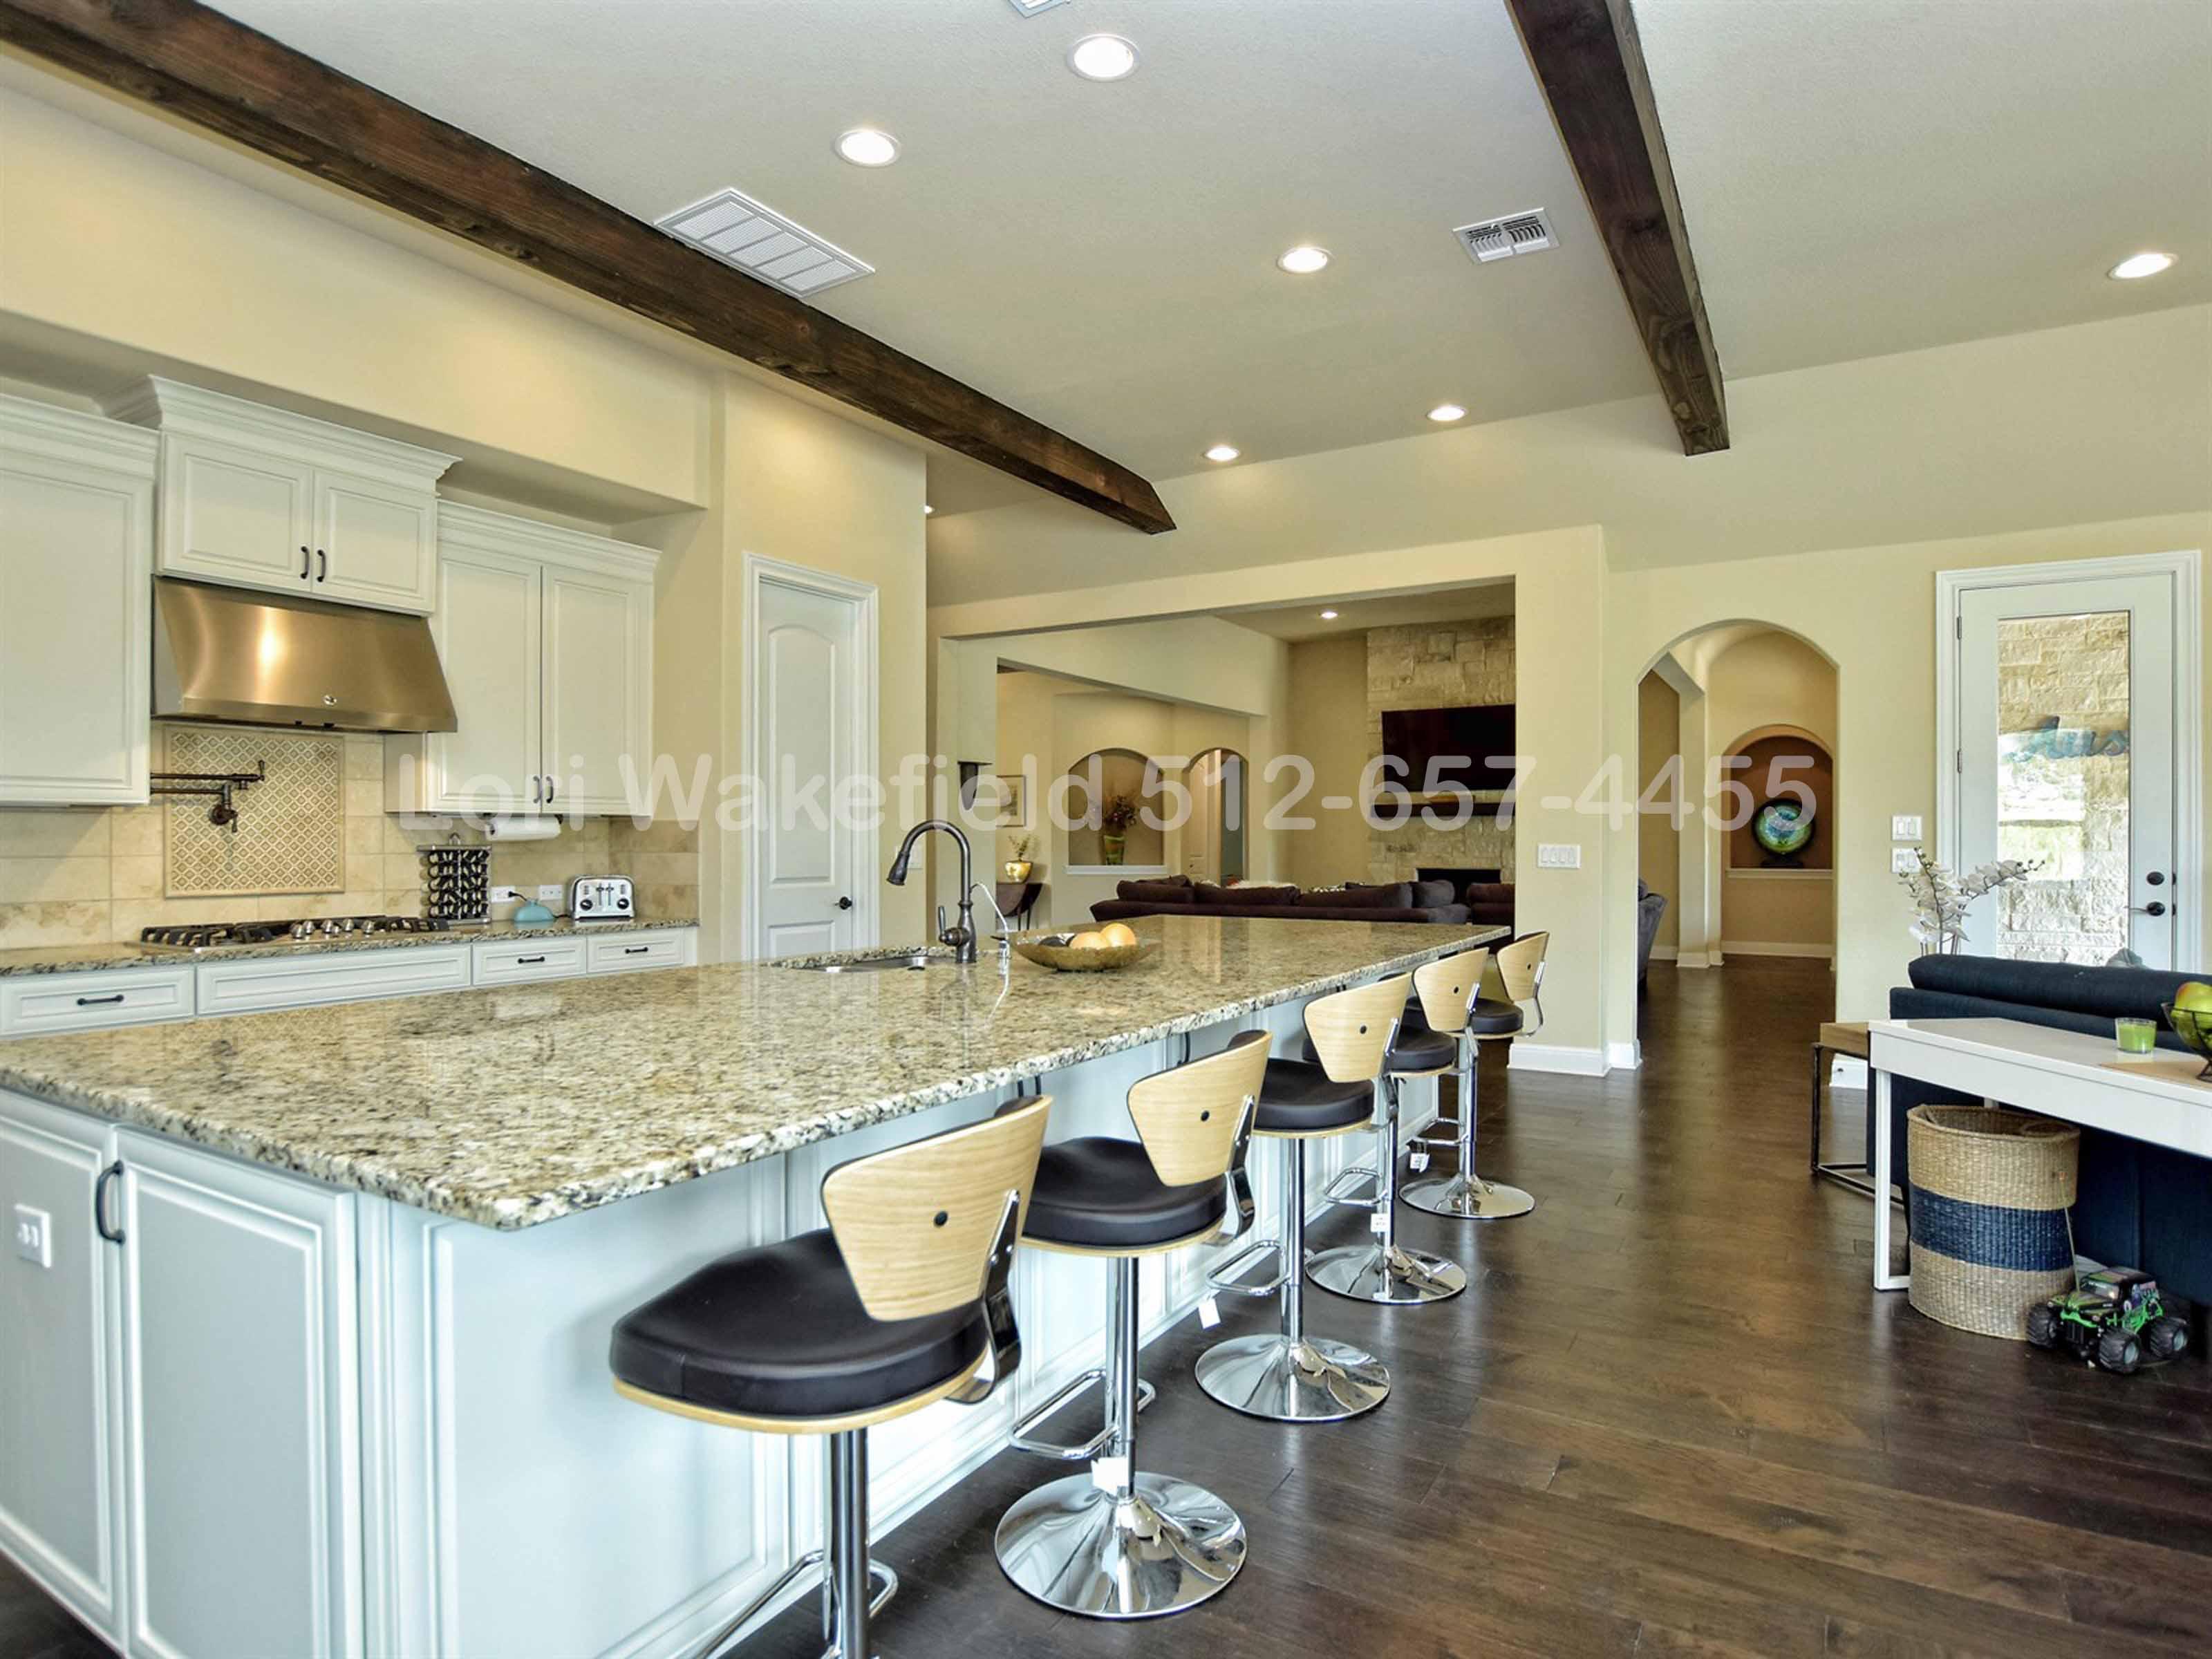 5421 DIamante Dr Spicewood TX | Lake Travis Home For Sale | Lori Wakefield Keller Williams Lake Travis